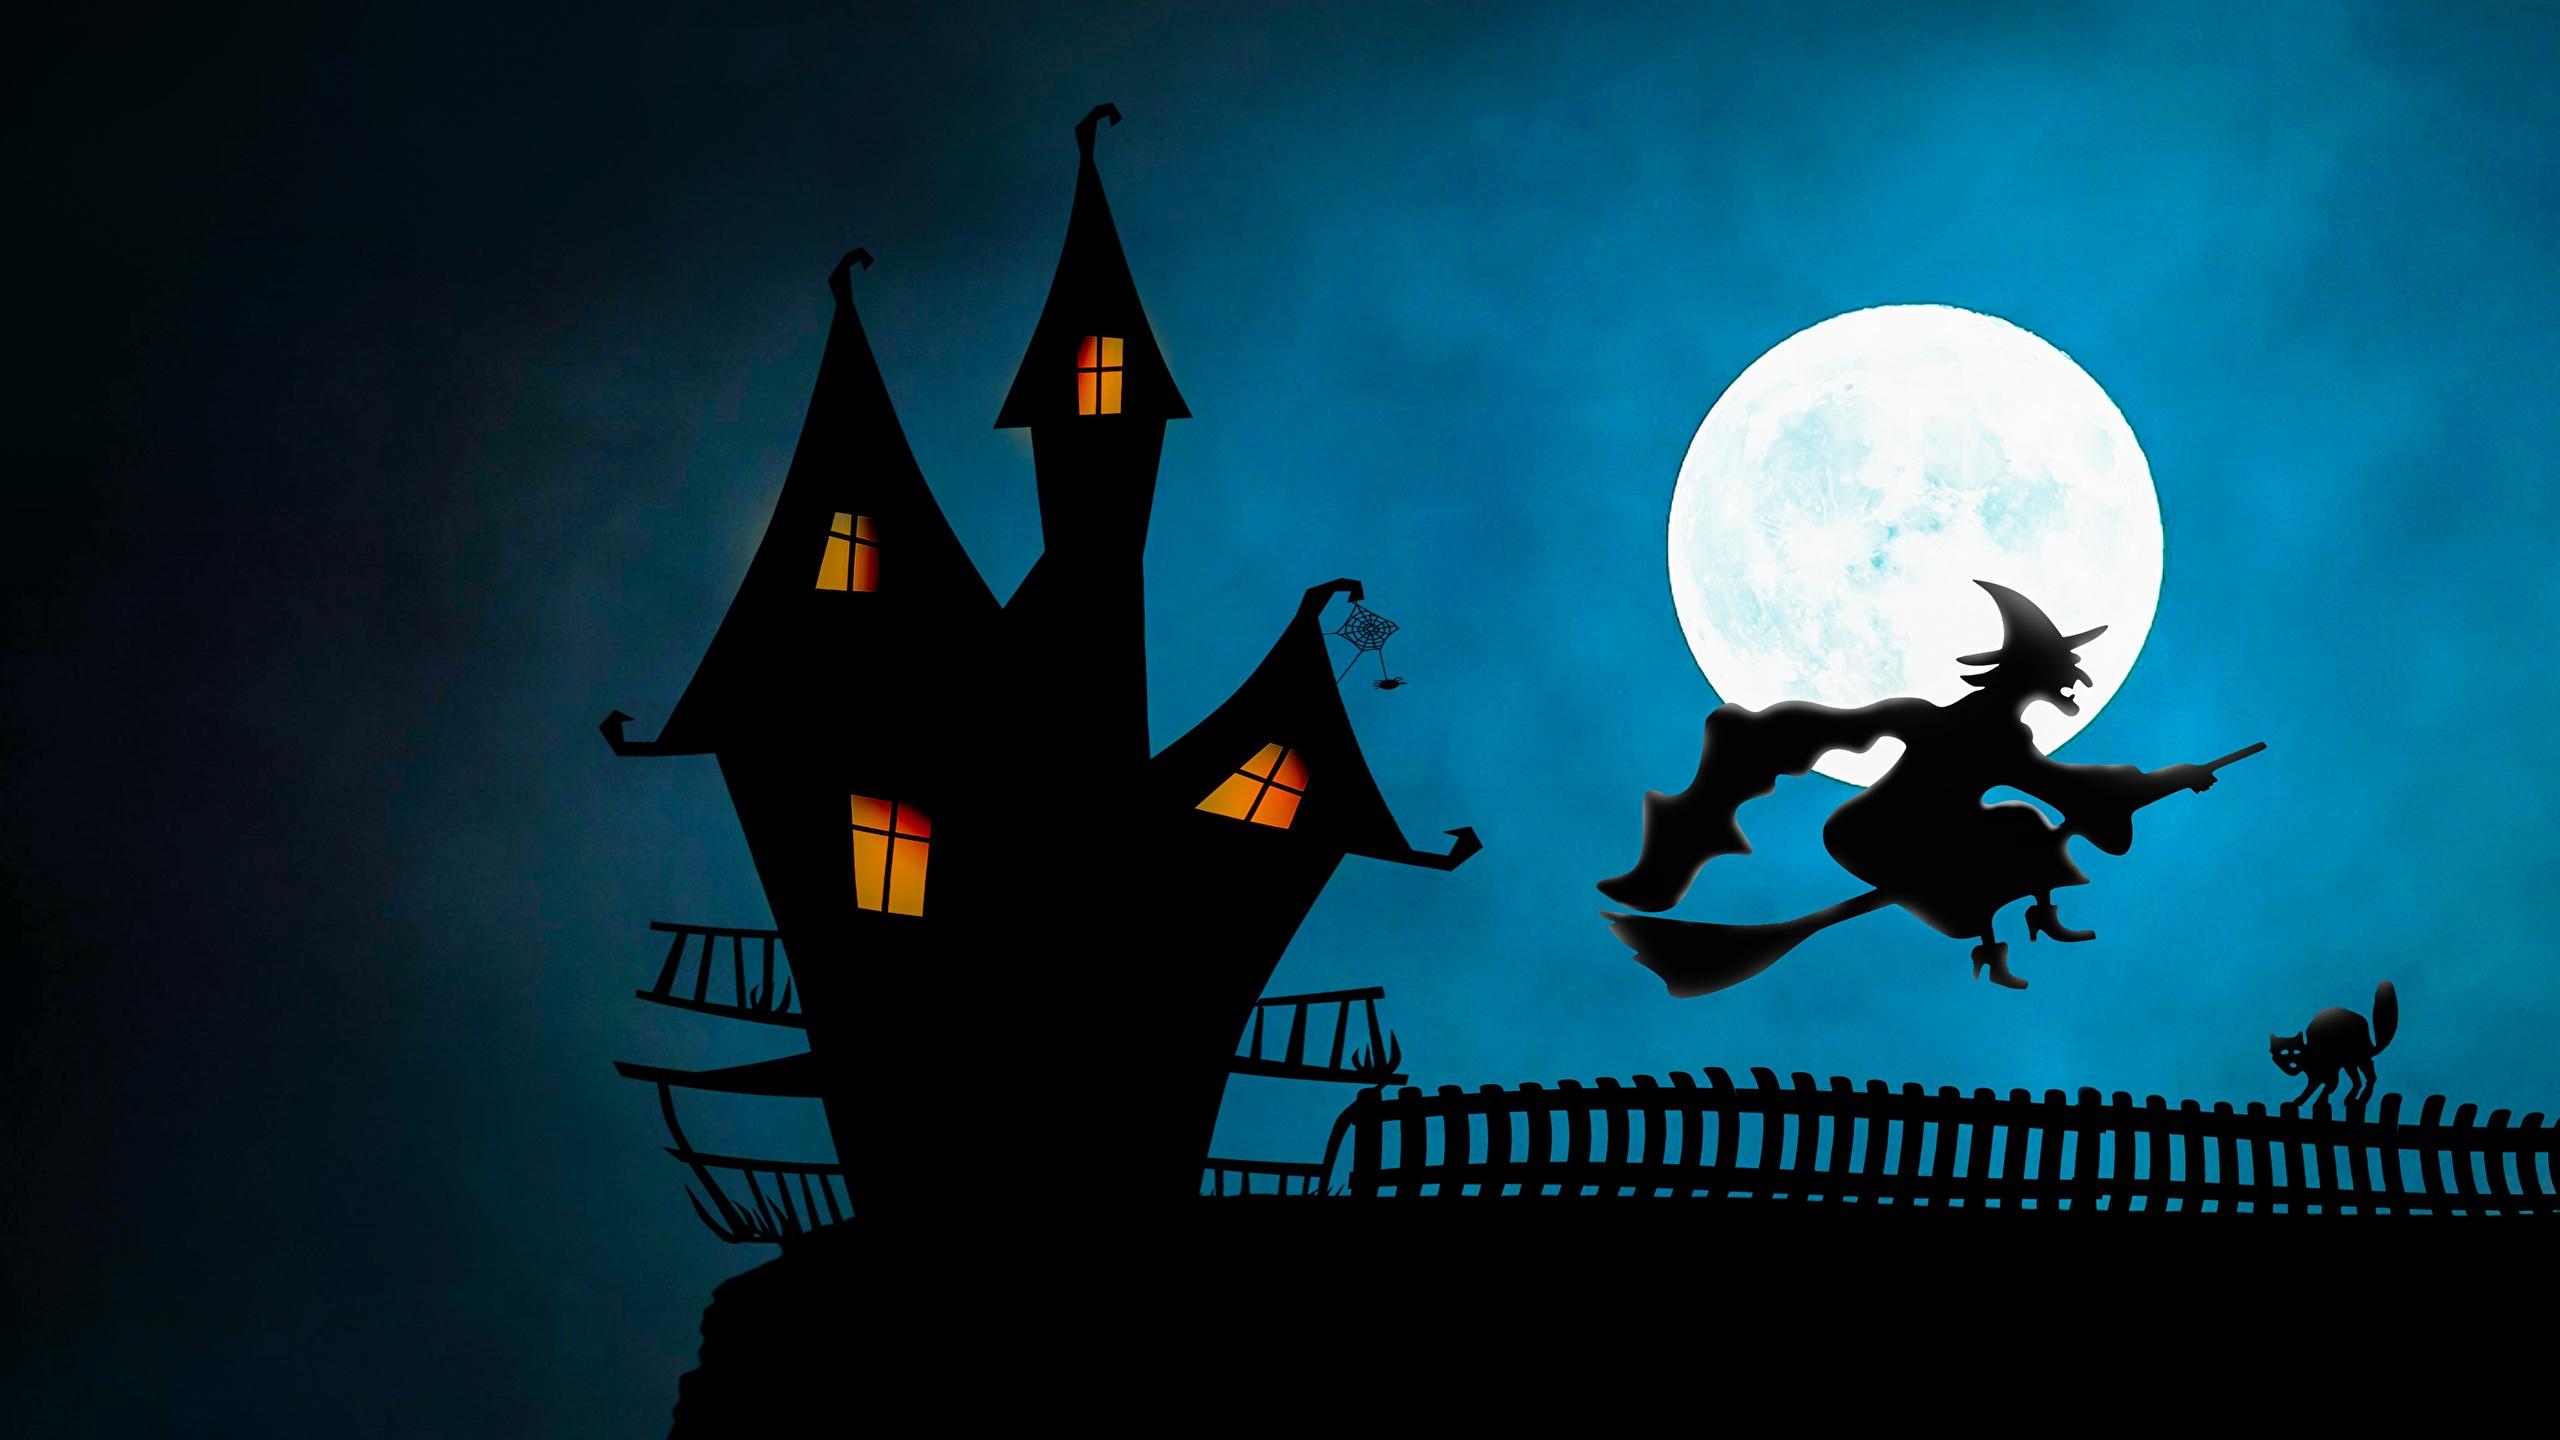 Картинки Ведьма хэллоуин Силуэт замок Луна 2560x1440 Хеллоуин силуэты силуэта Замки луны луной